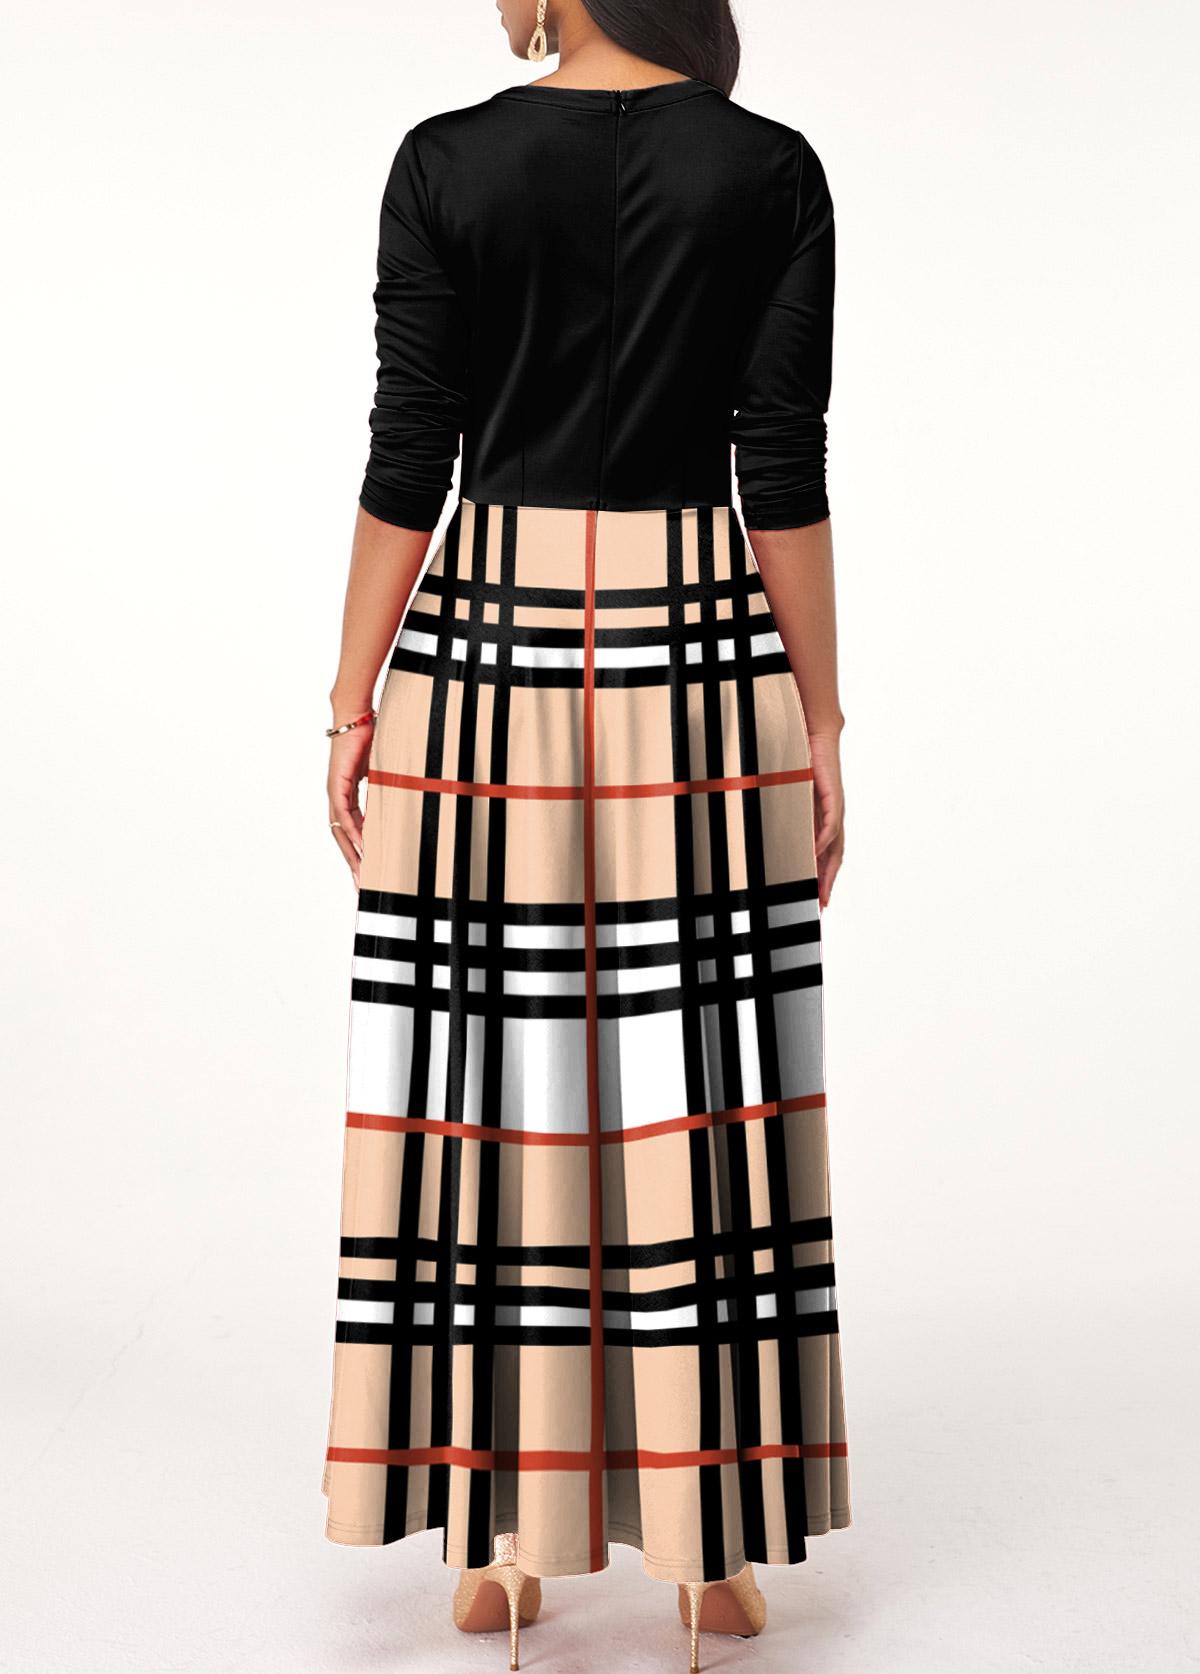 Long Sleeve Plaid Bowknot Maxi Dress